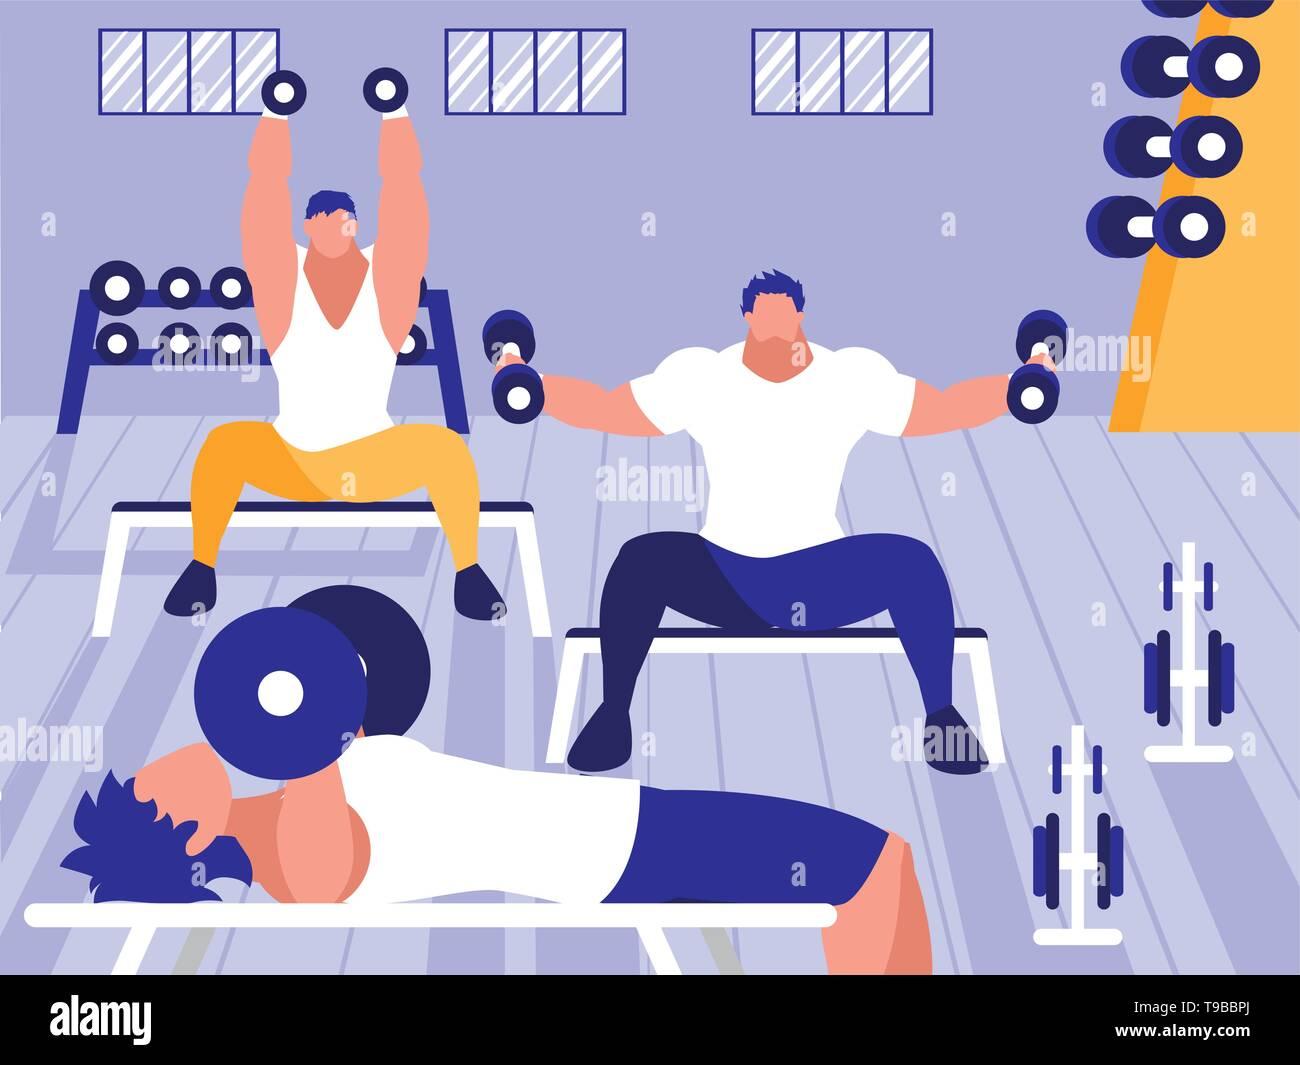 young men lifting dumbbells in gym vector illustration design - Stock Image